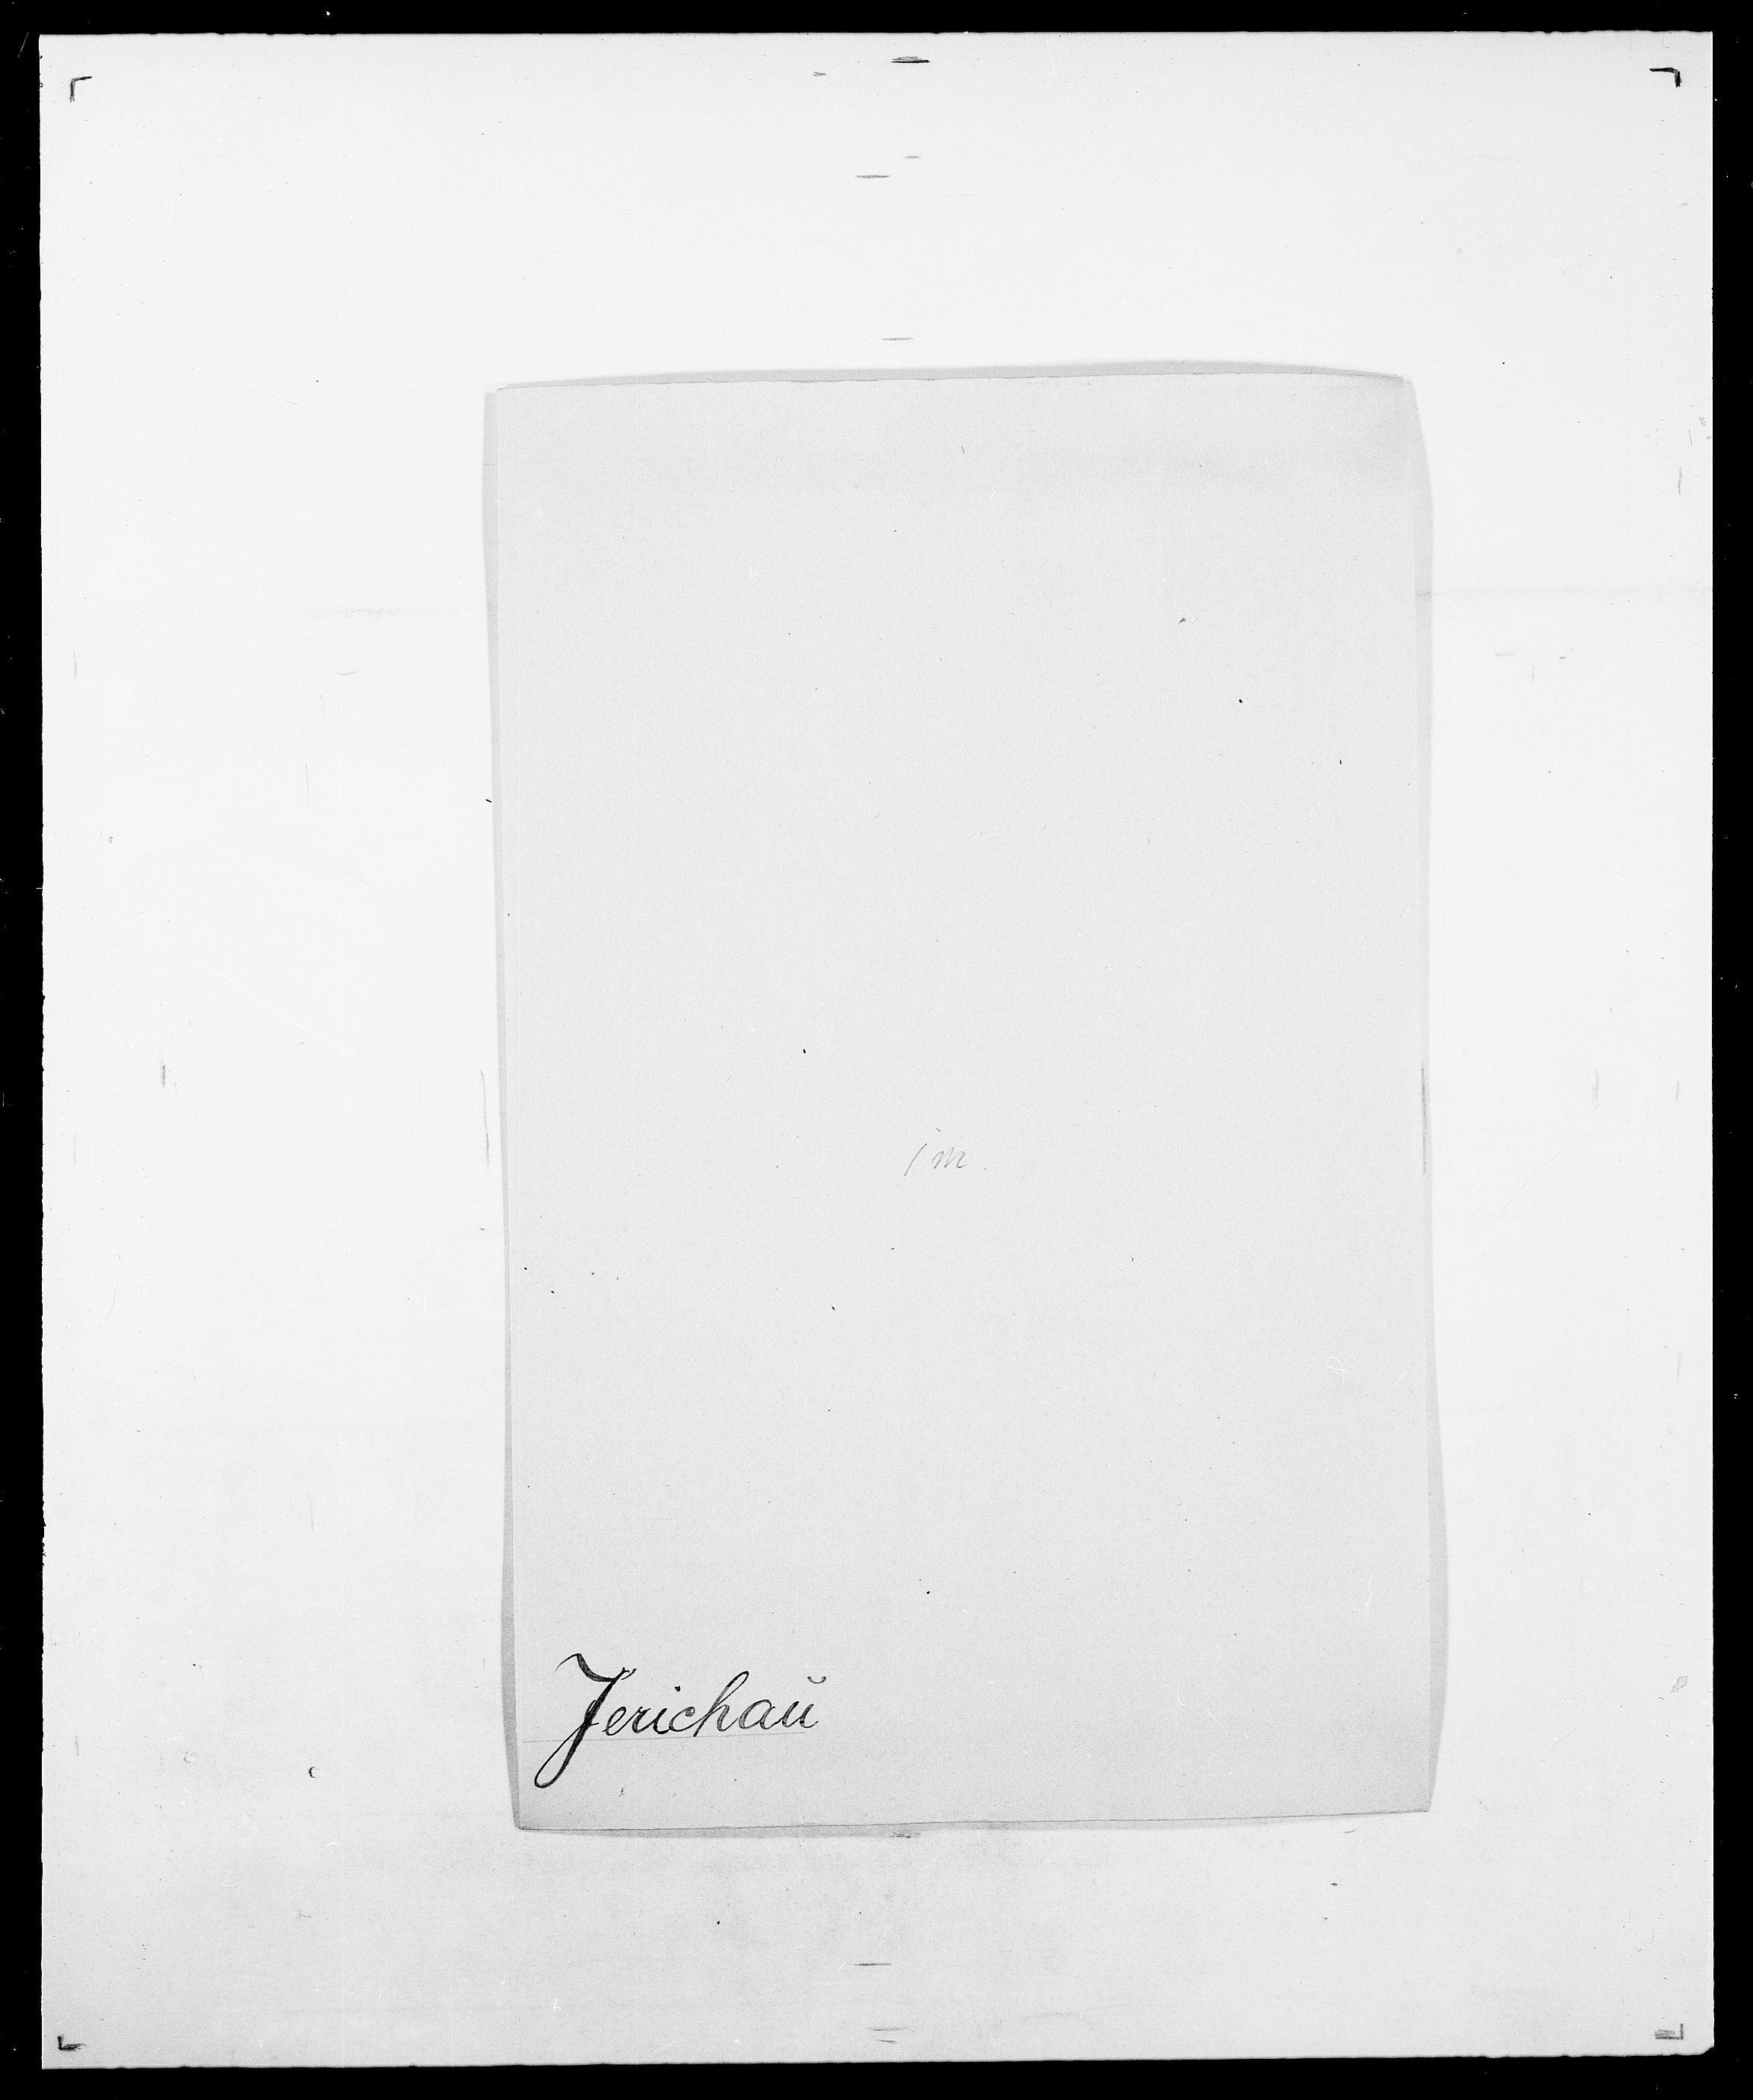 SAO, Delgobe, Charles Antoine - samling, D/Da/L0019: van der Hude - Joys, s. 701